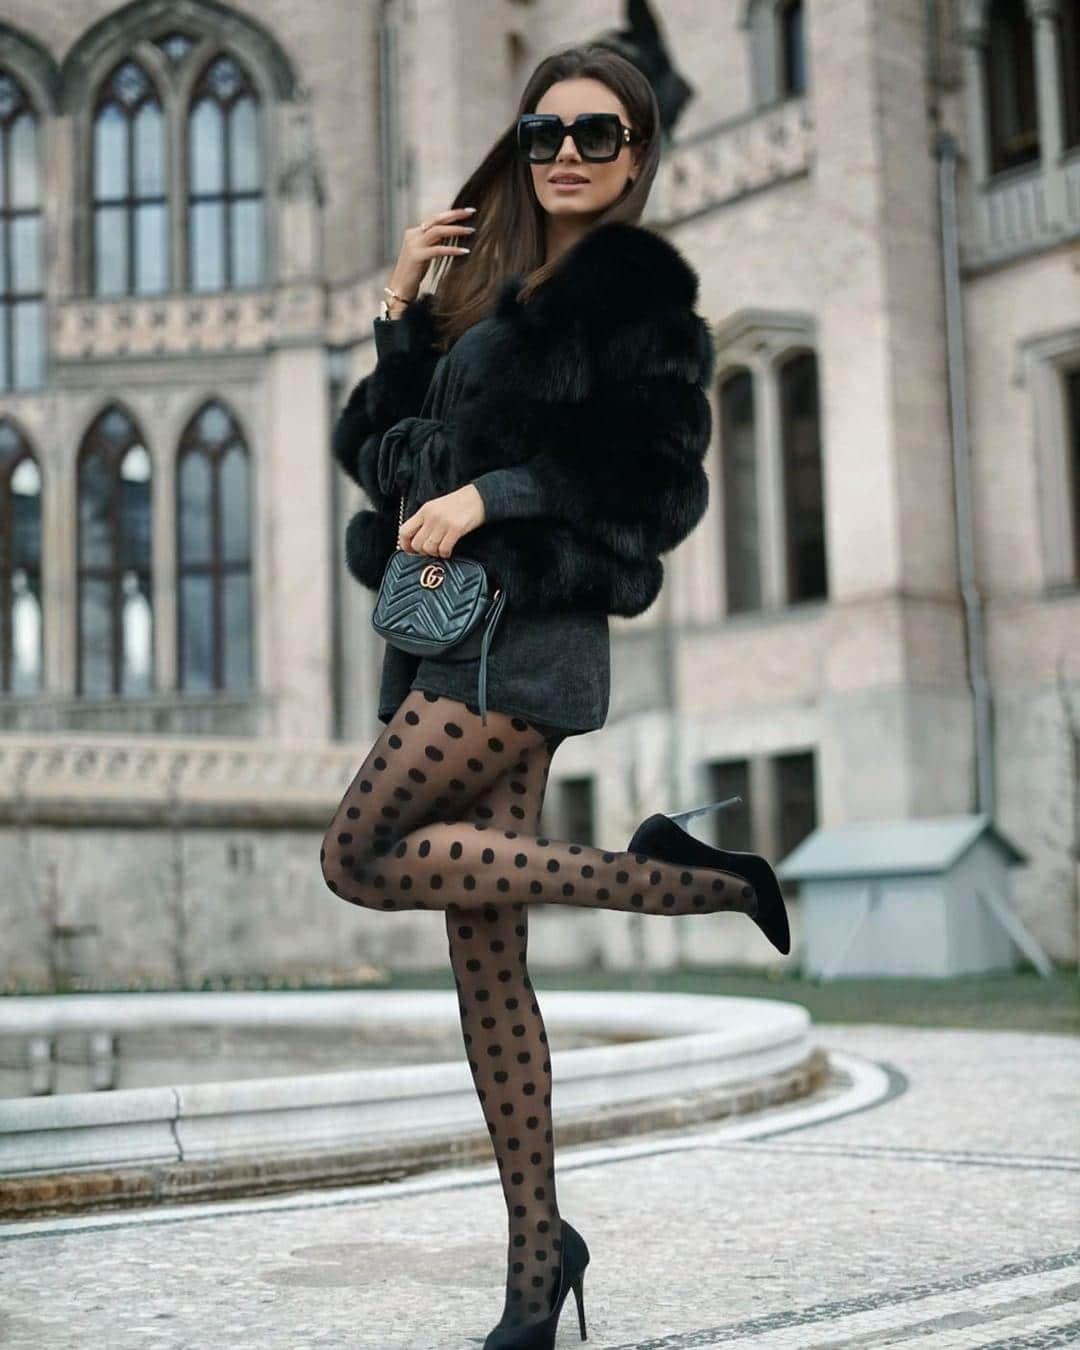 audrey-black-veronika_klimovits-3